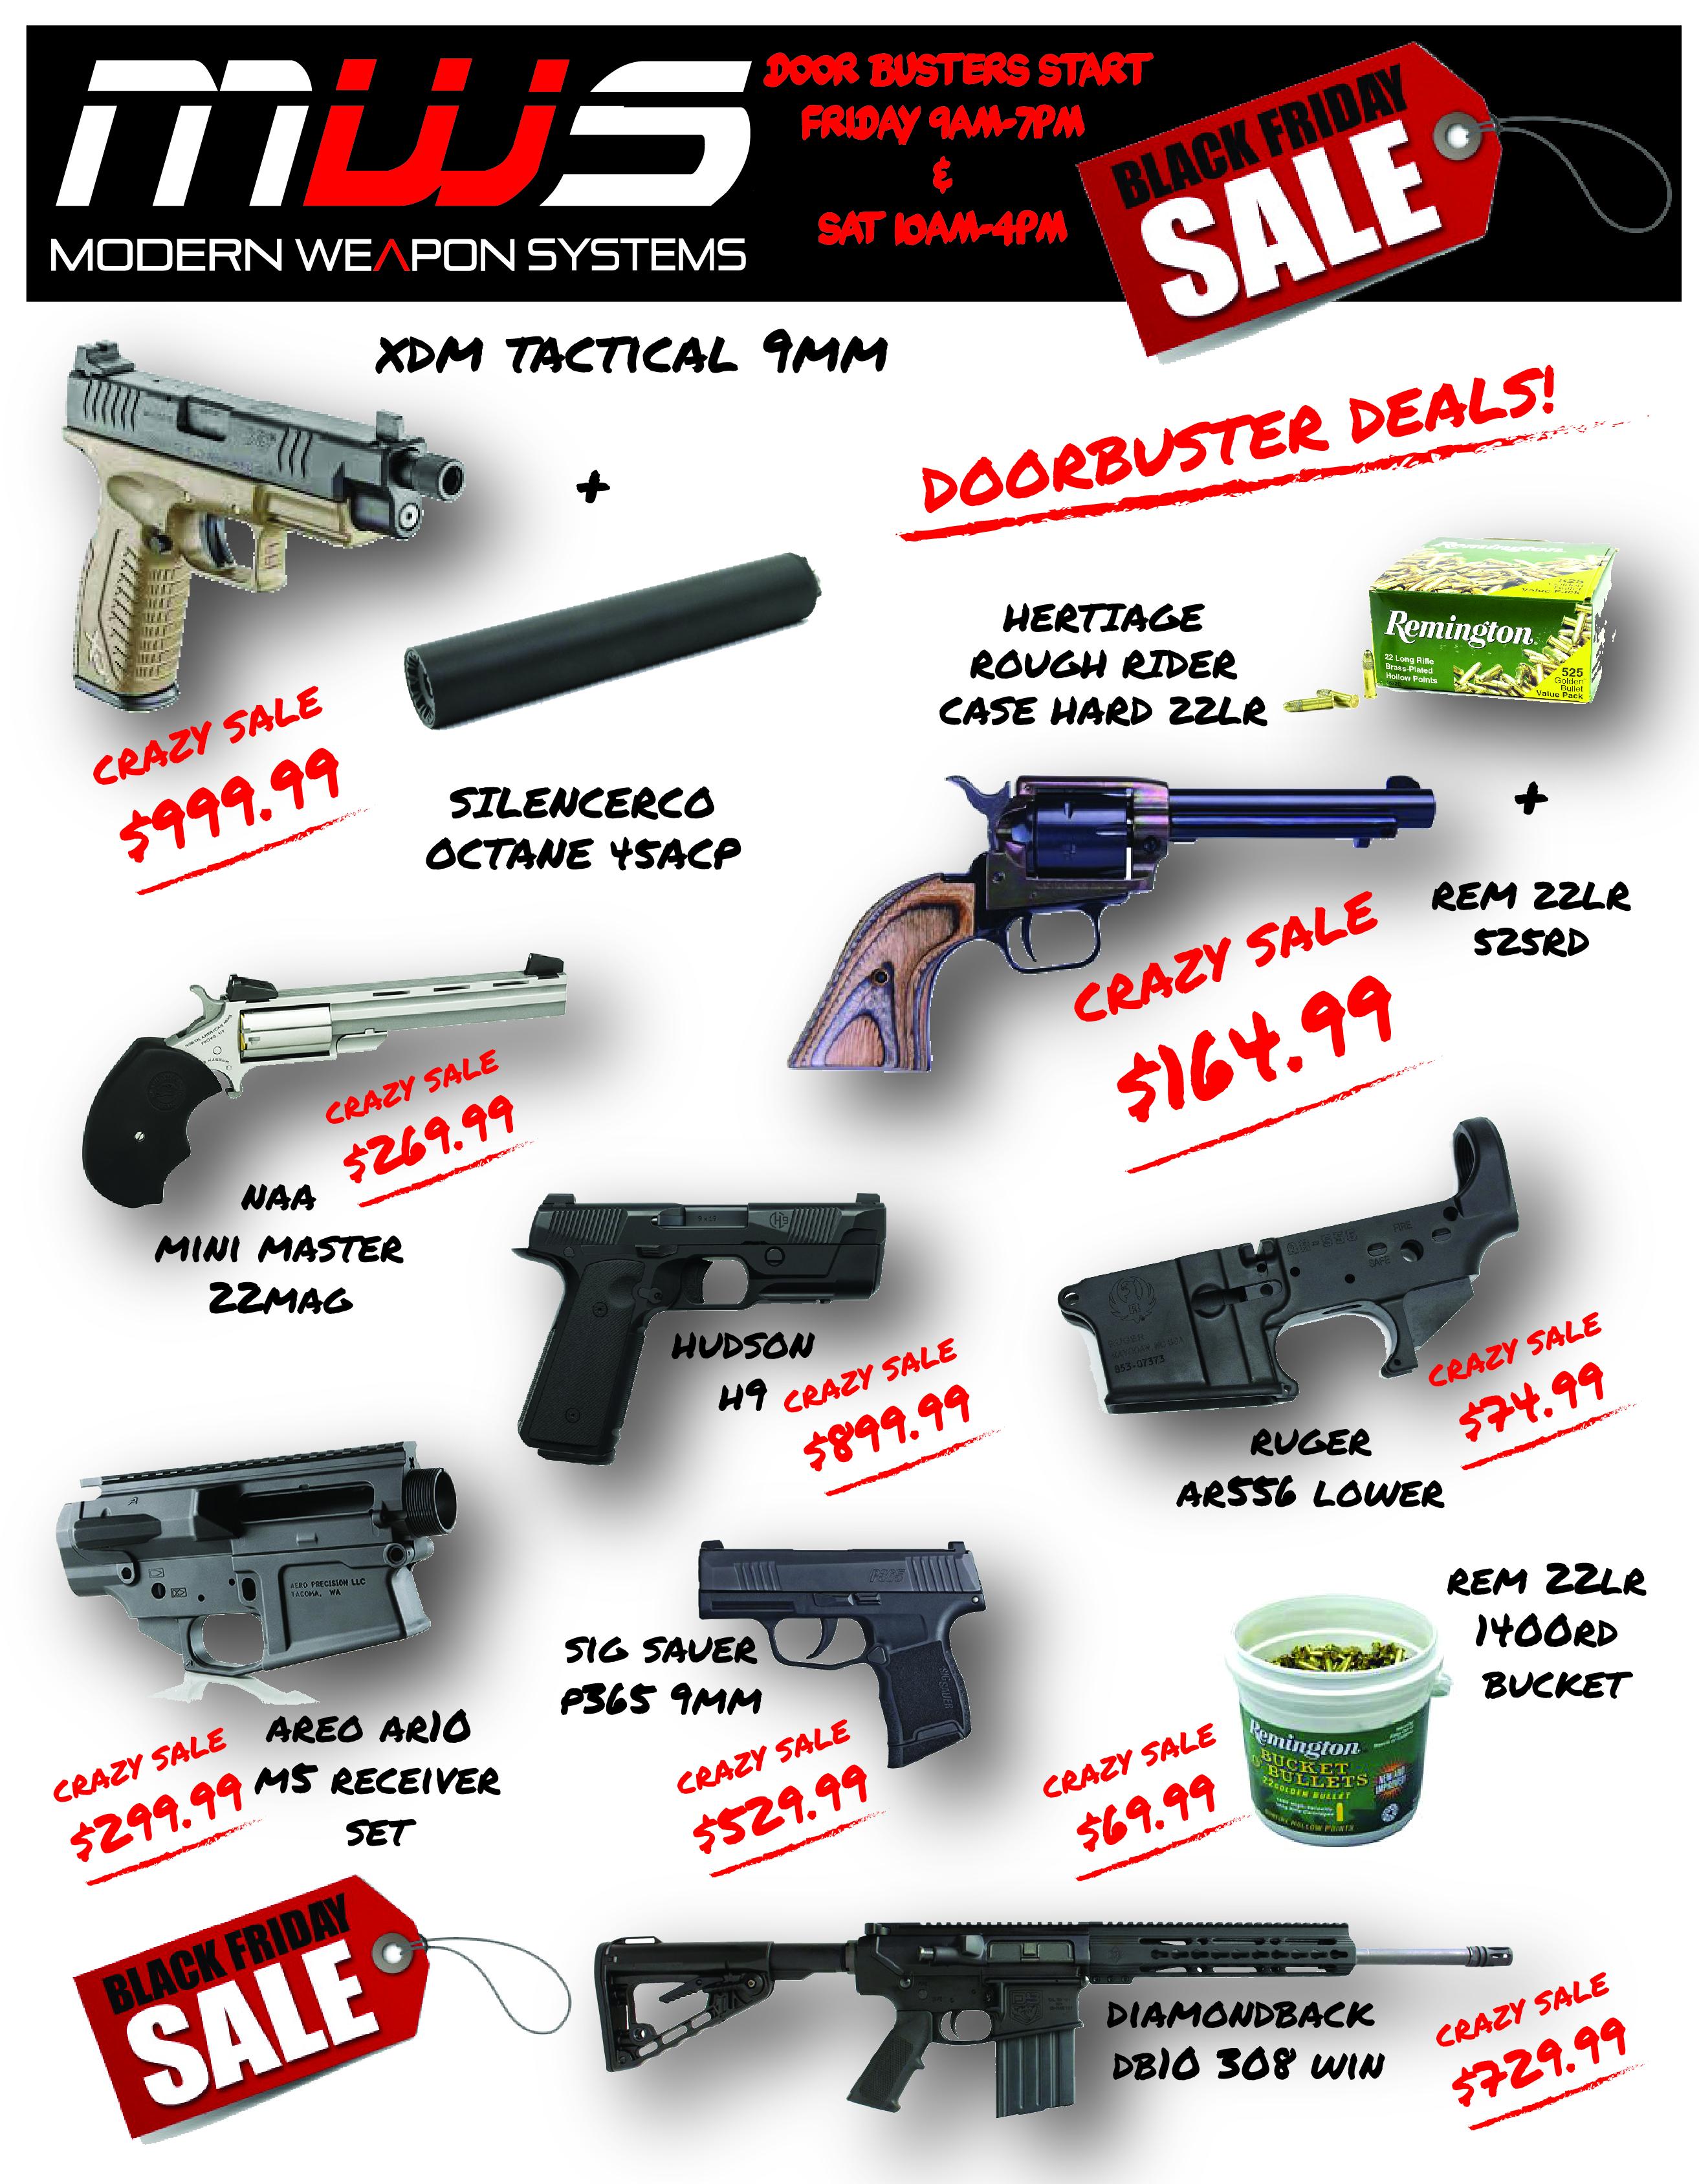 Black Friday Sale – November 28, 2014